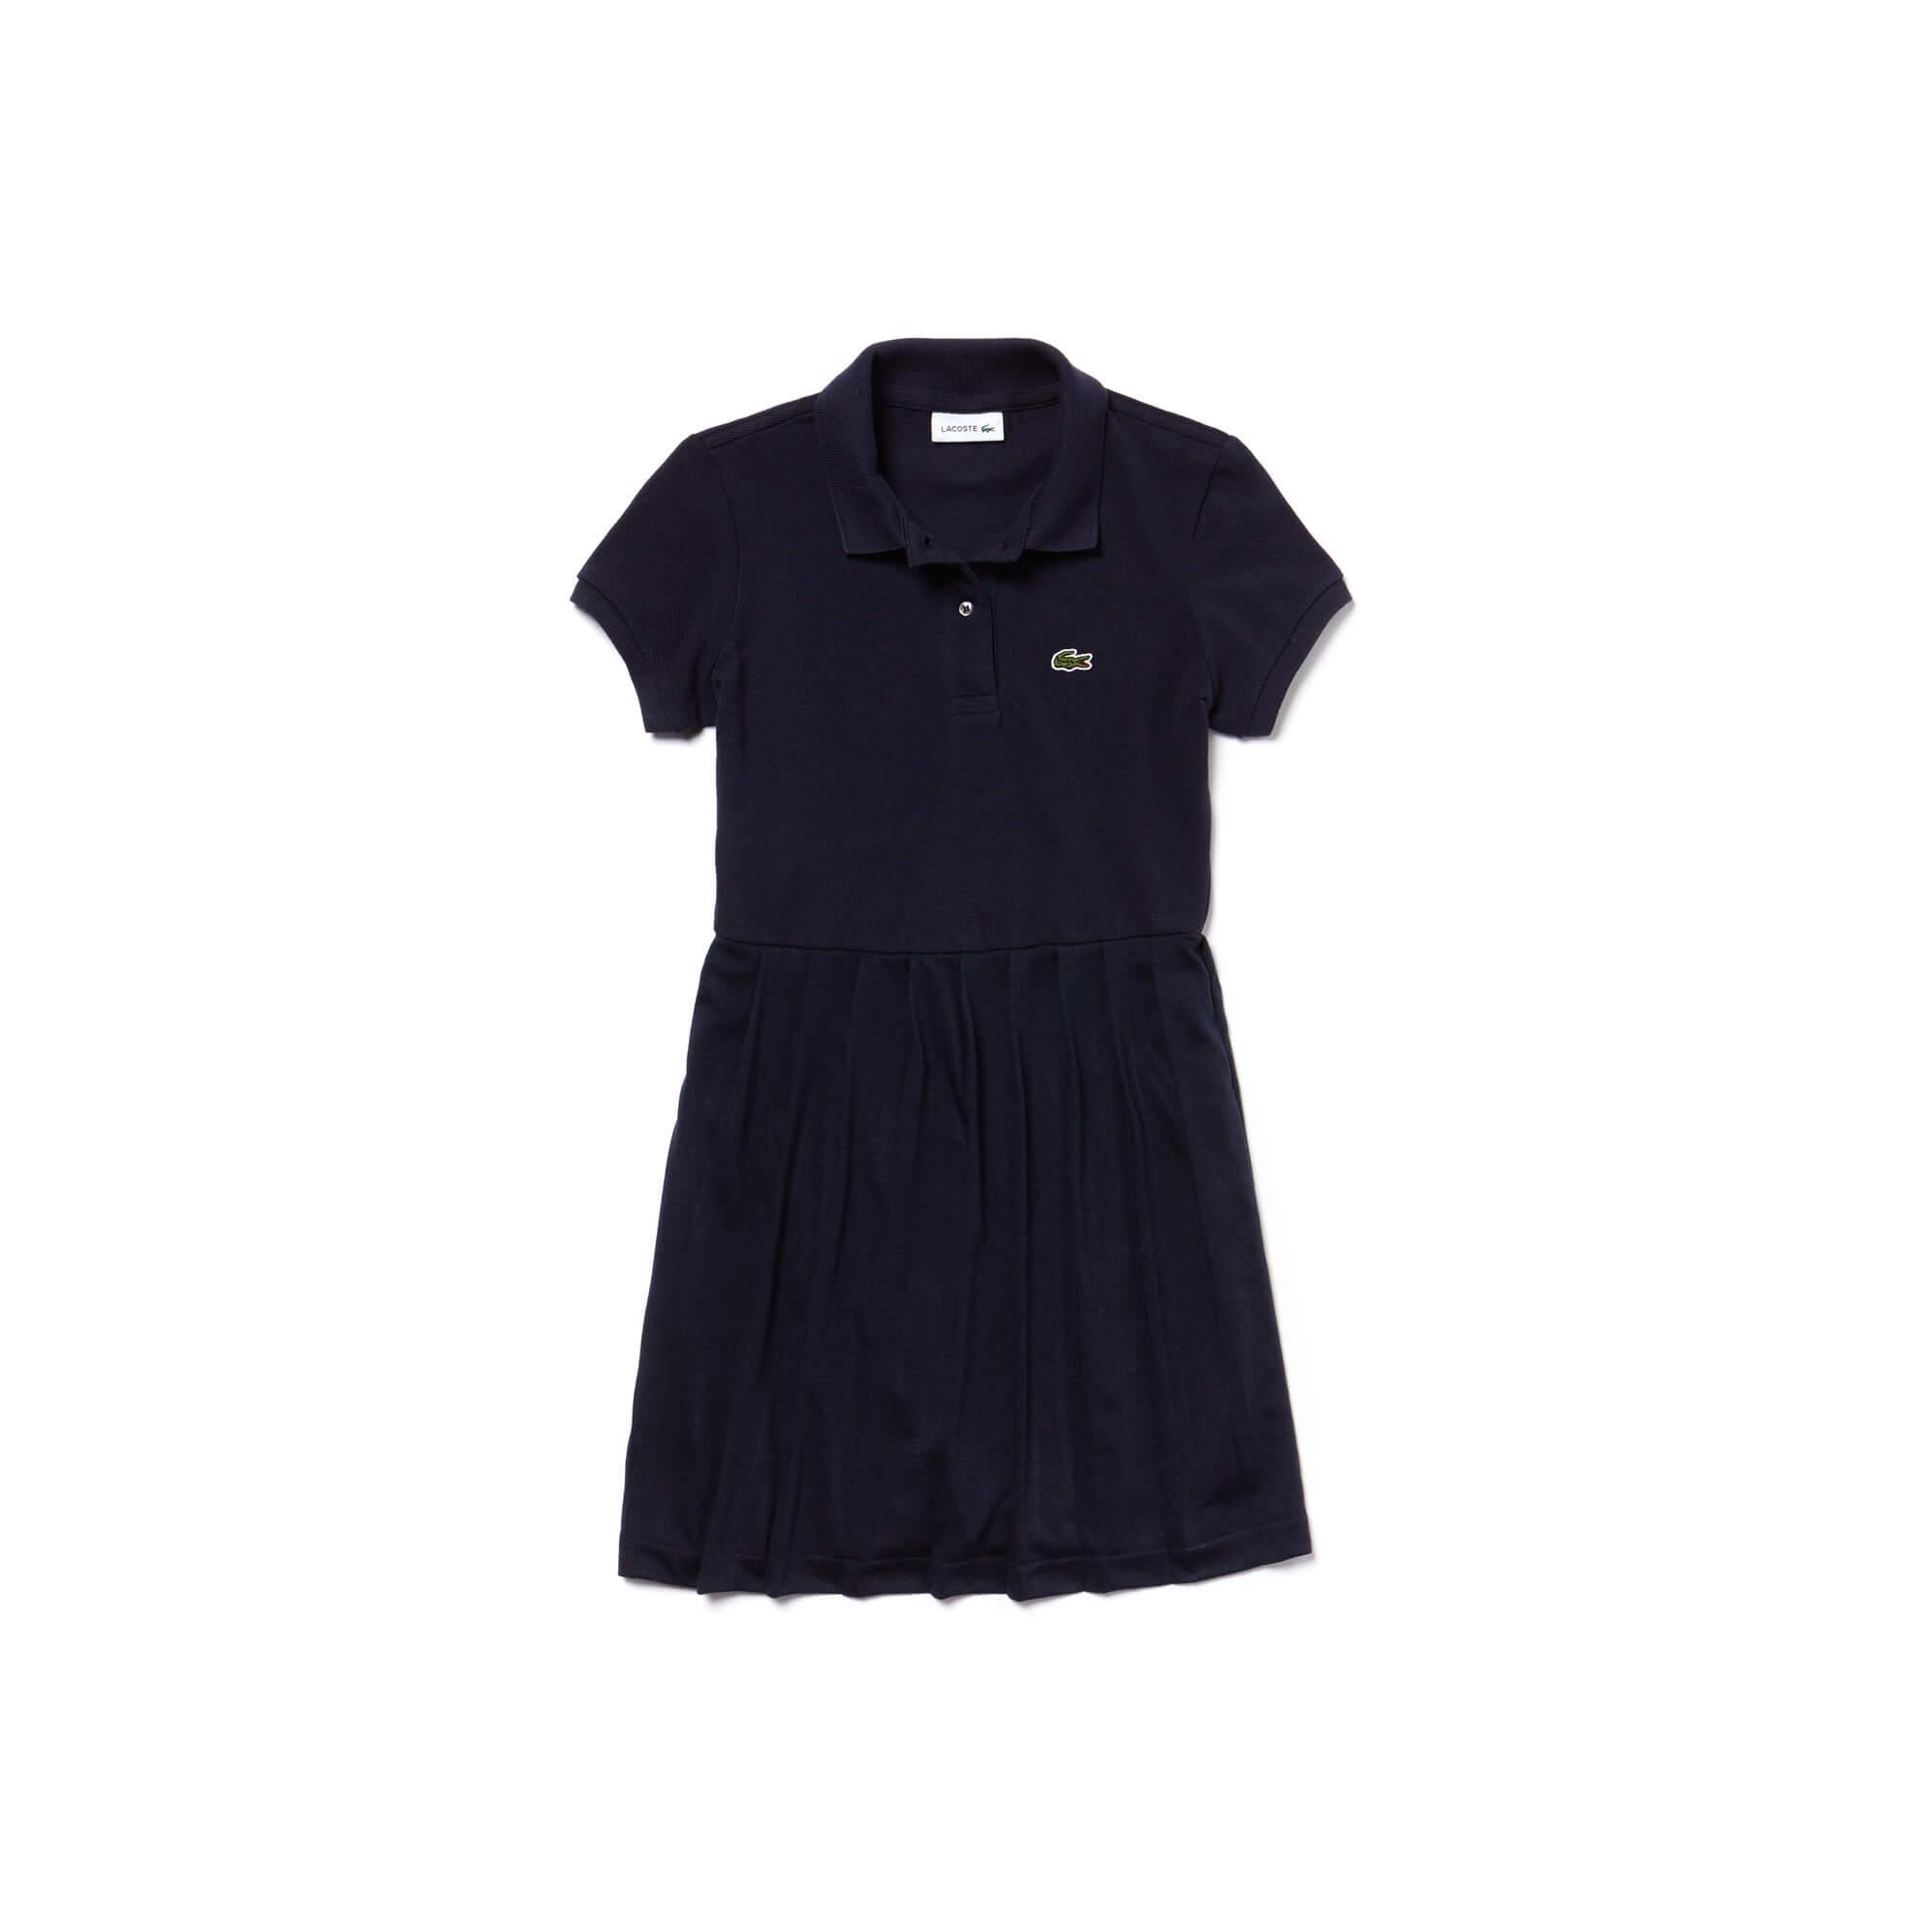 Lacoste Kız Çocuk Lacivert Elbise